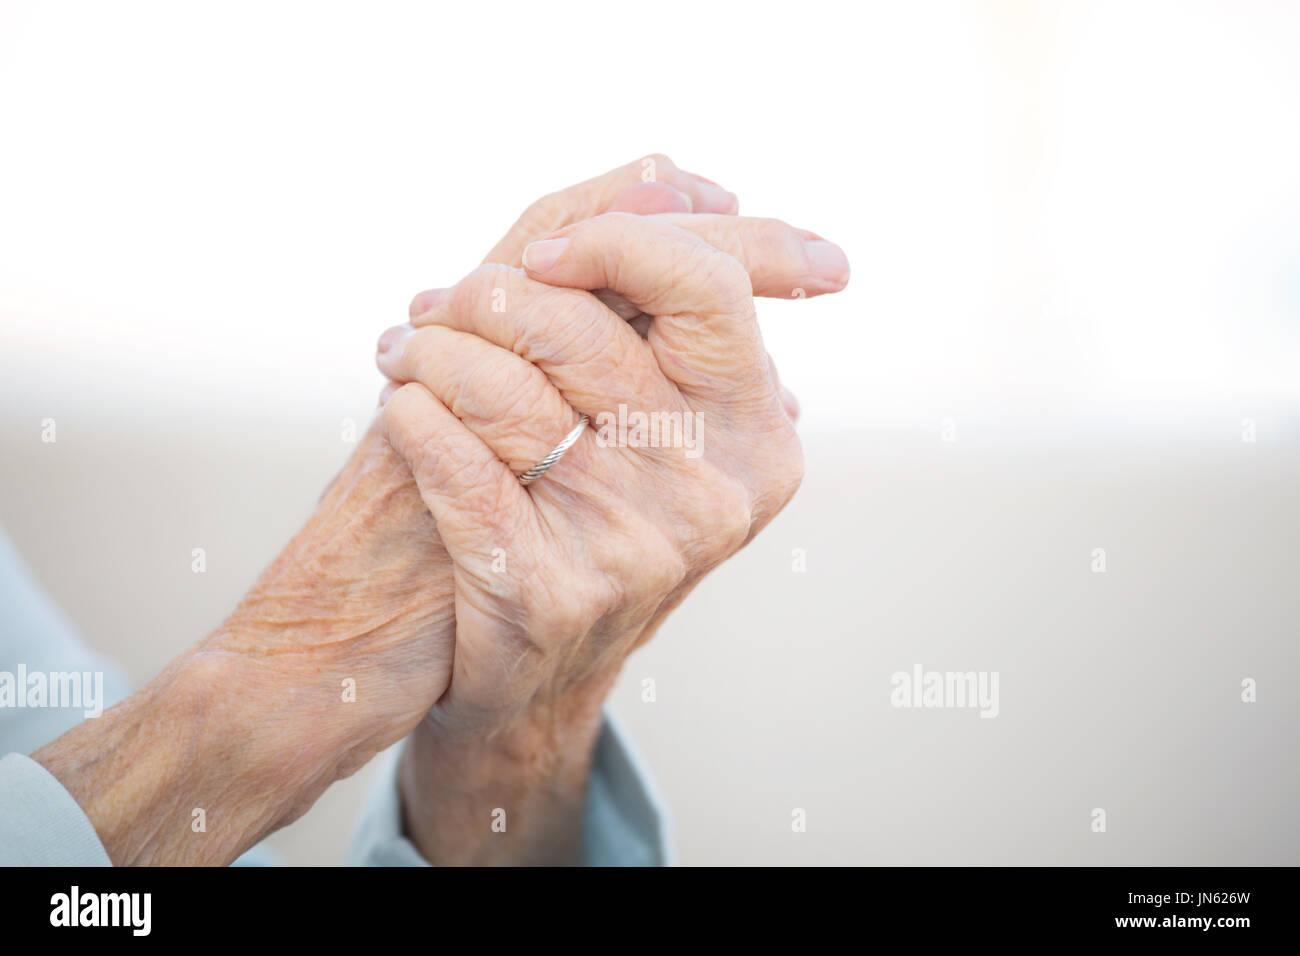 Ältere Frau mit Arthritis. Stockbild